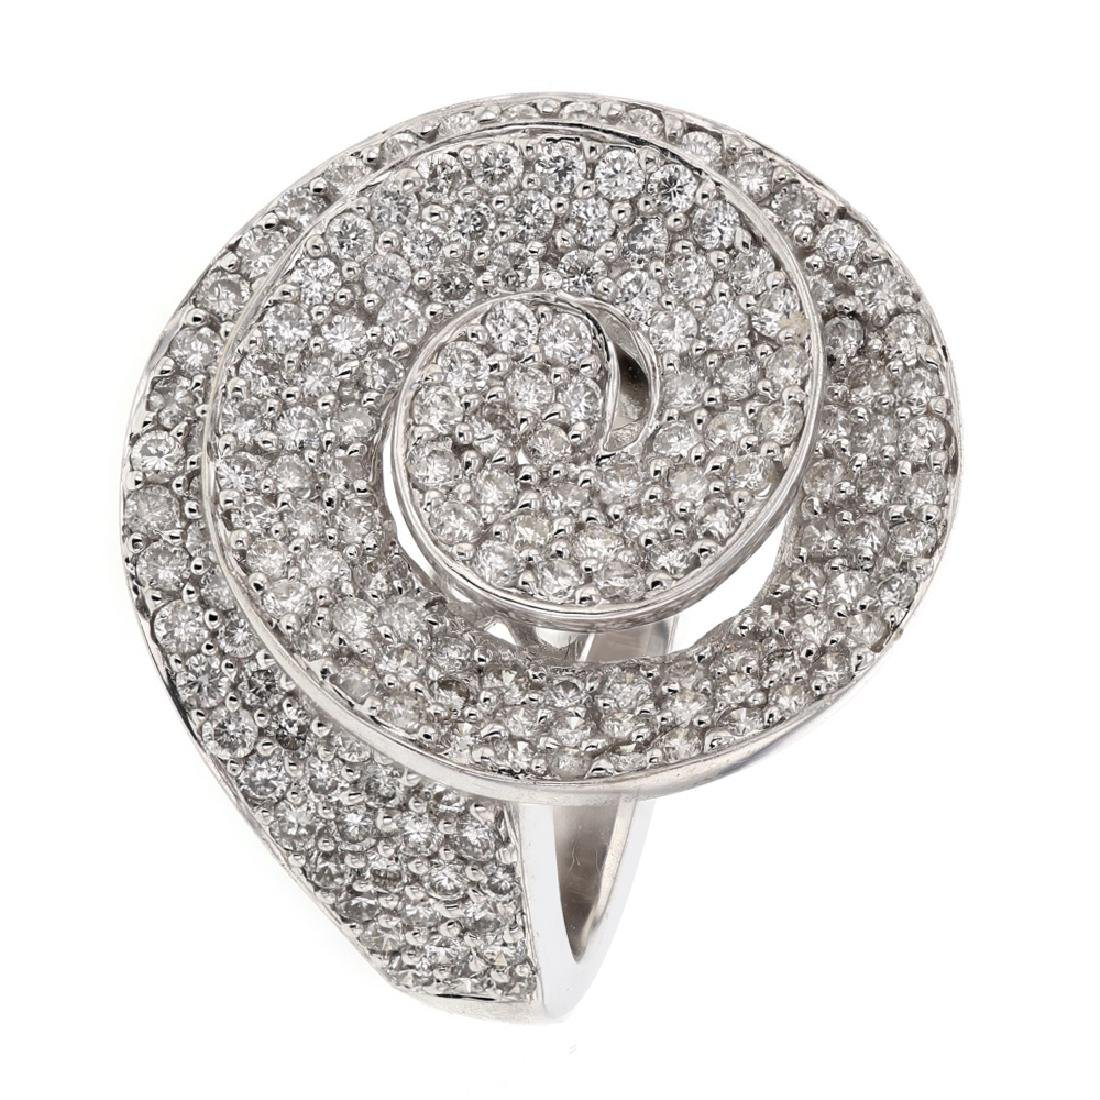 2.36 CTW Diamond Ring 18K White Gold - REF-225Y5X - 2